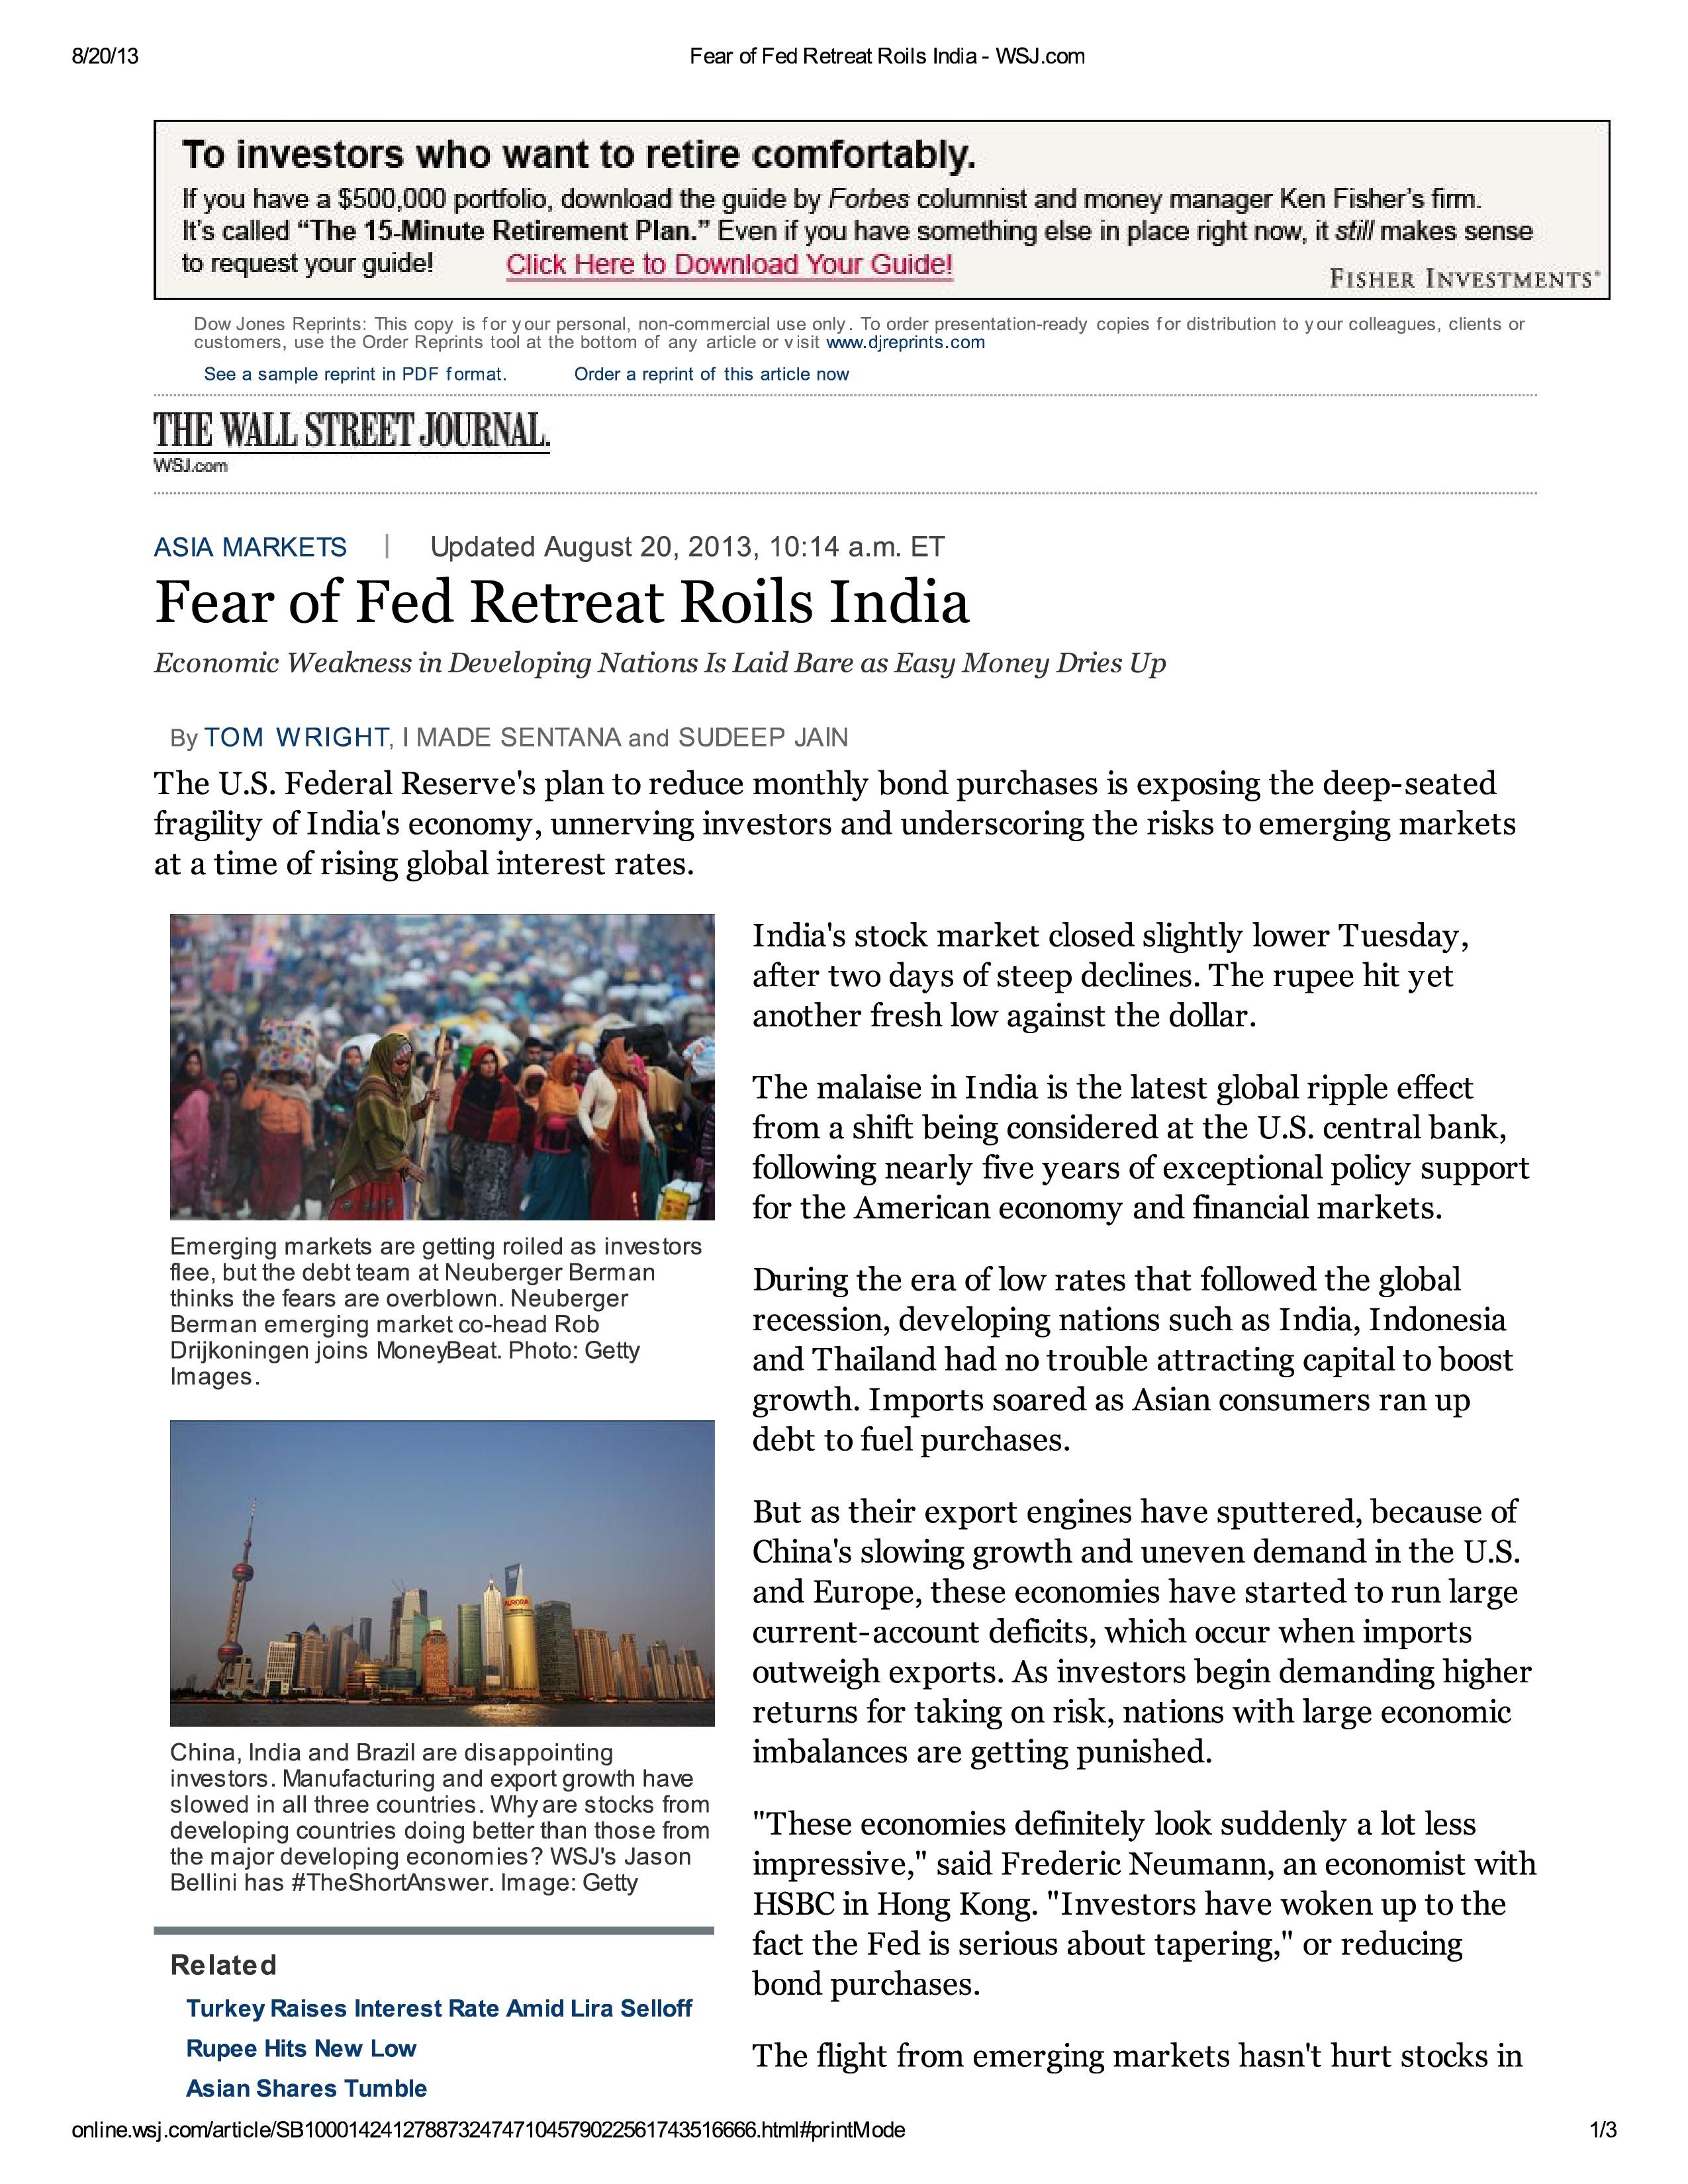 India_economic distress-page-0